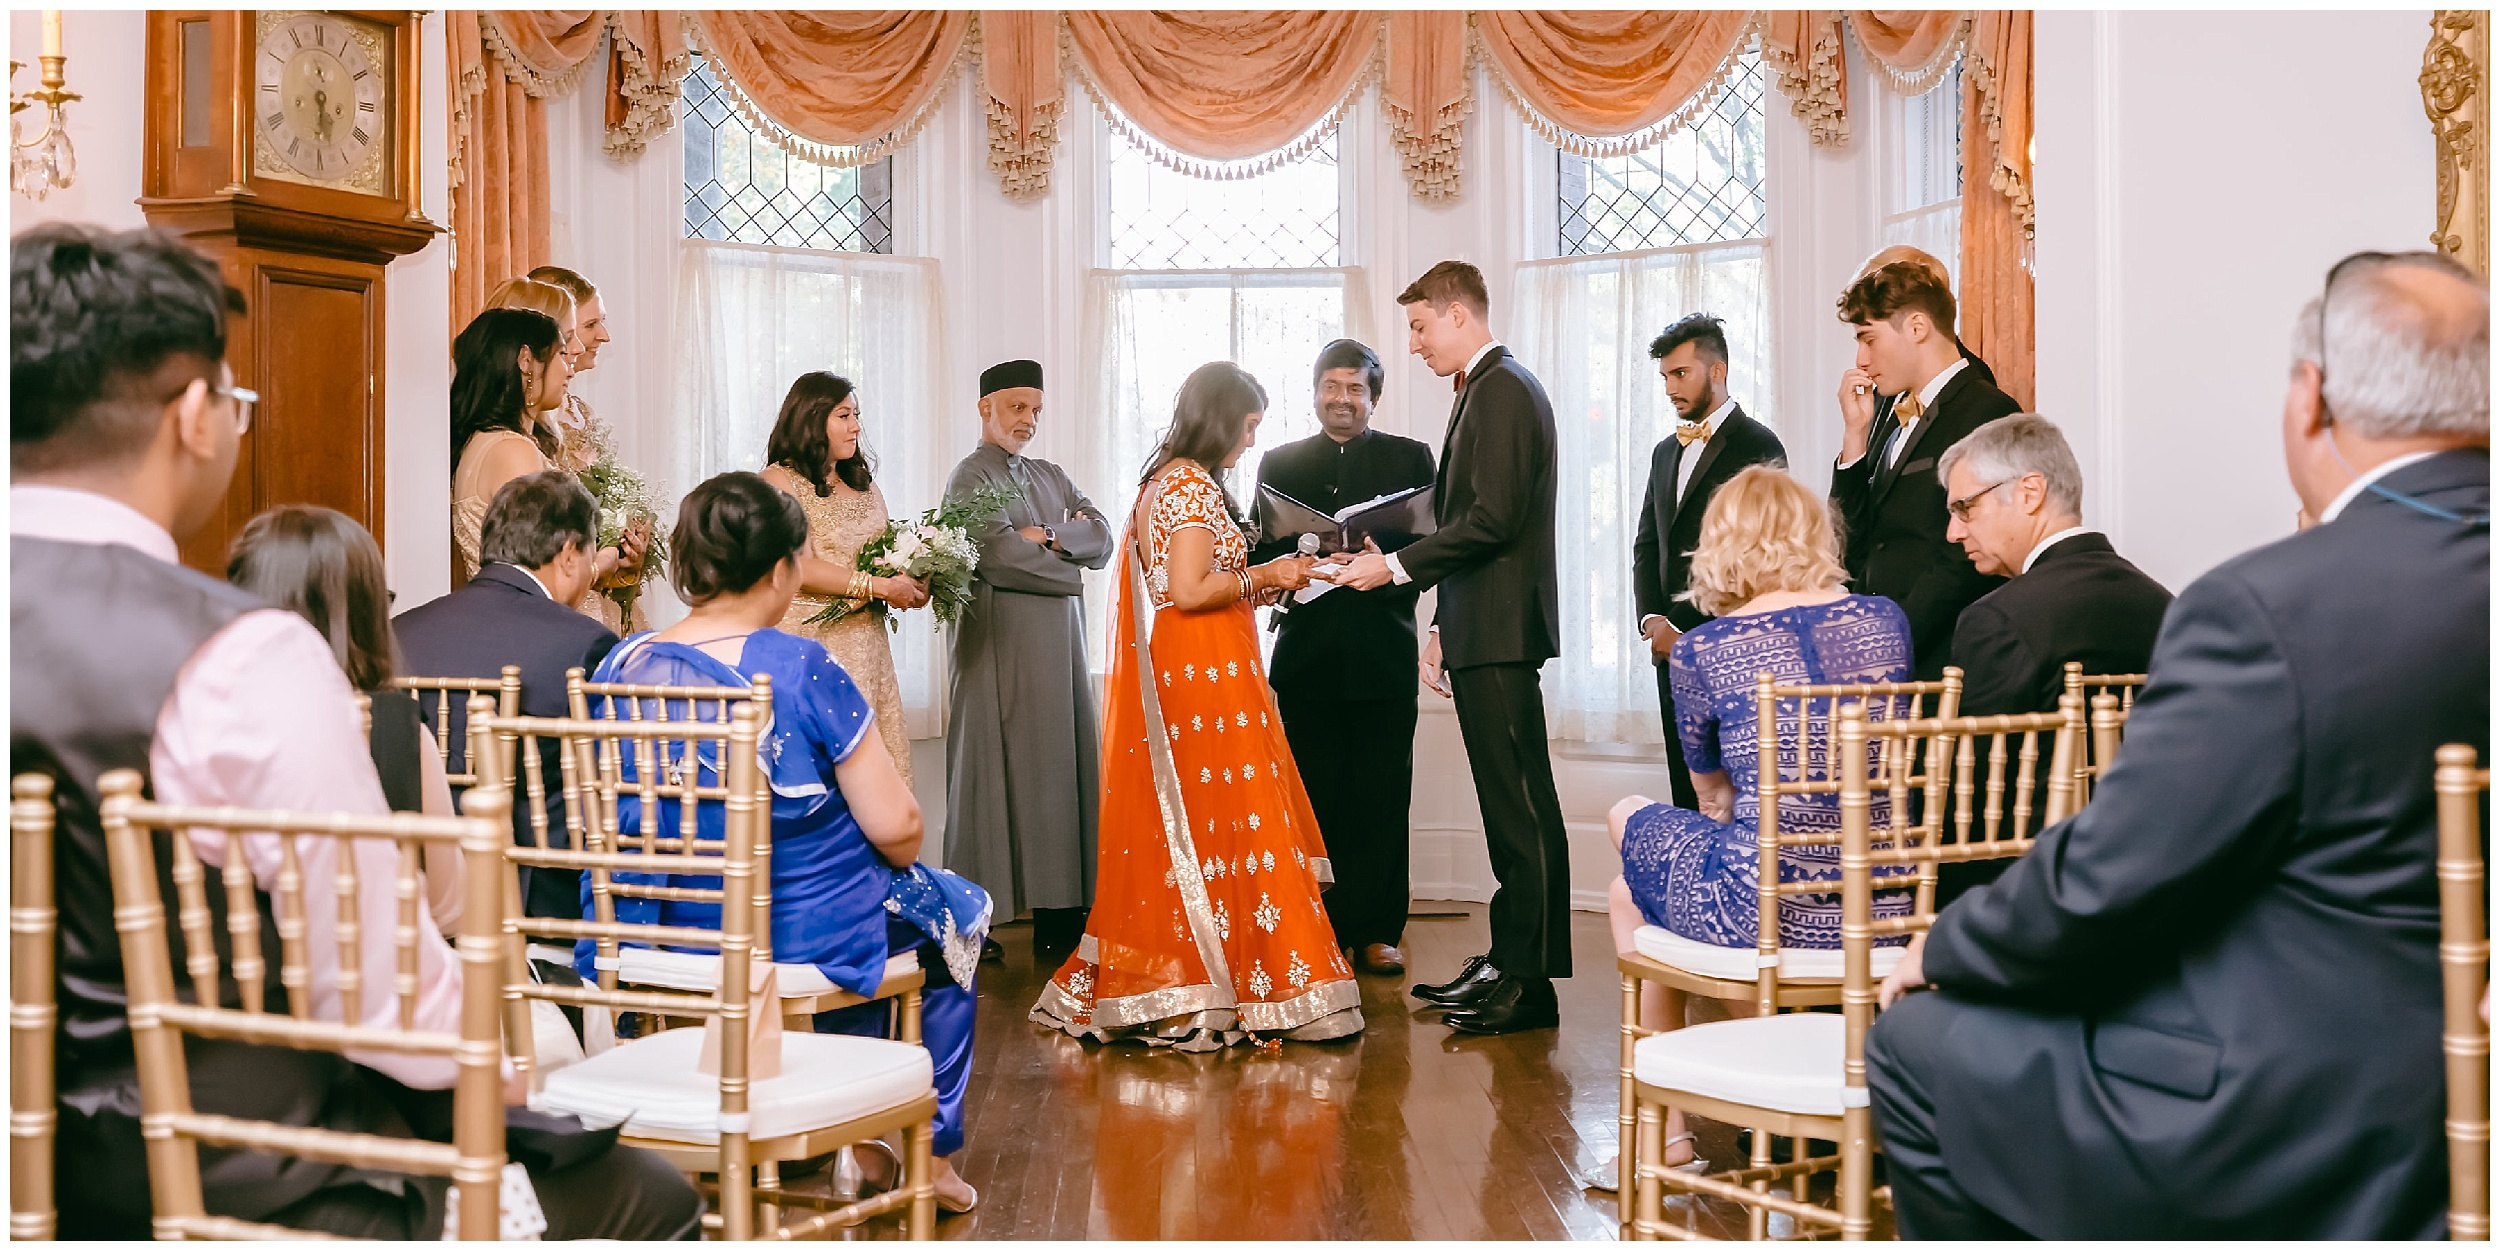 ceremony exchange rings Whittemore House wedding Washington DC